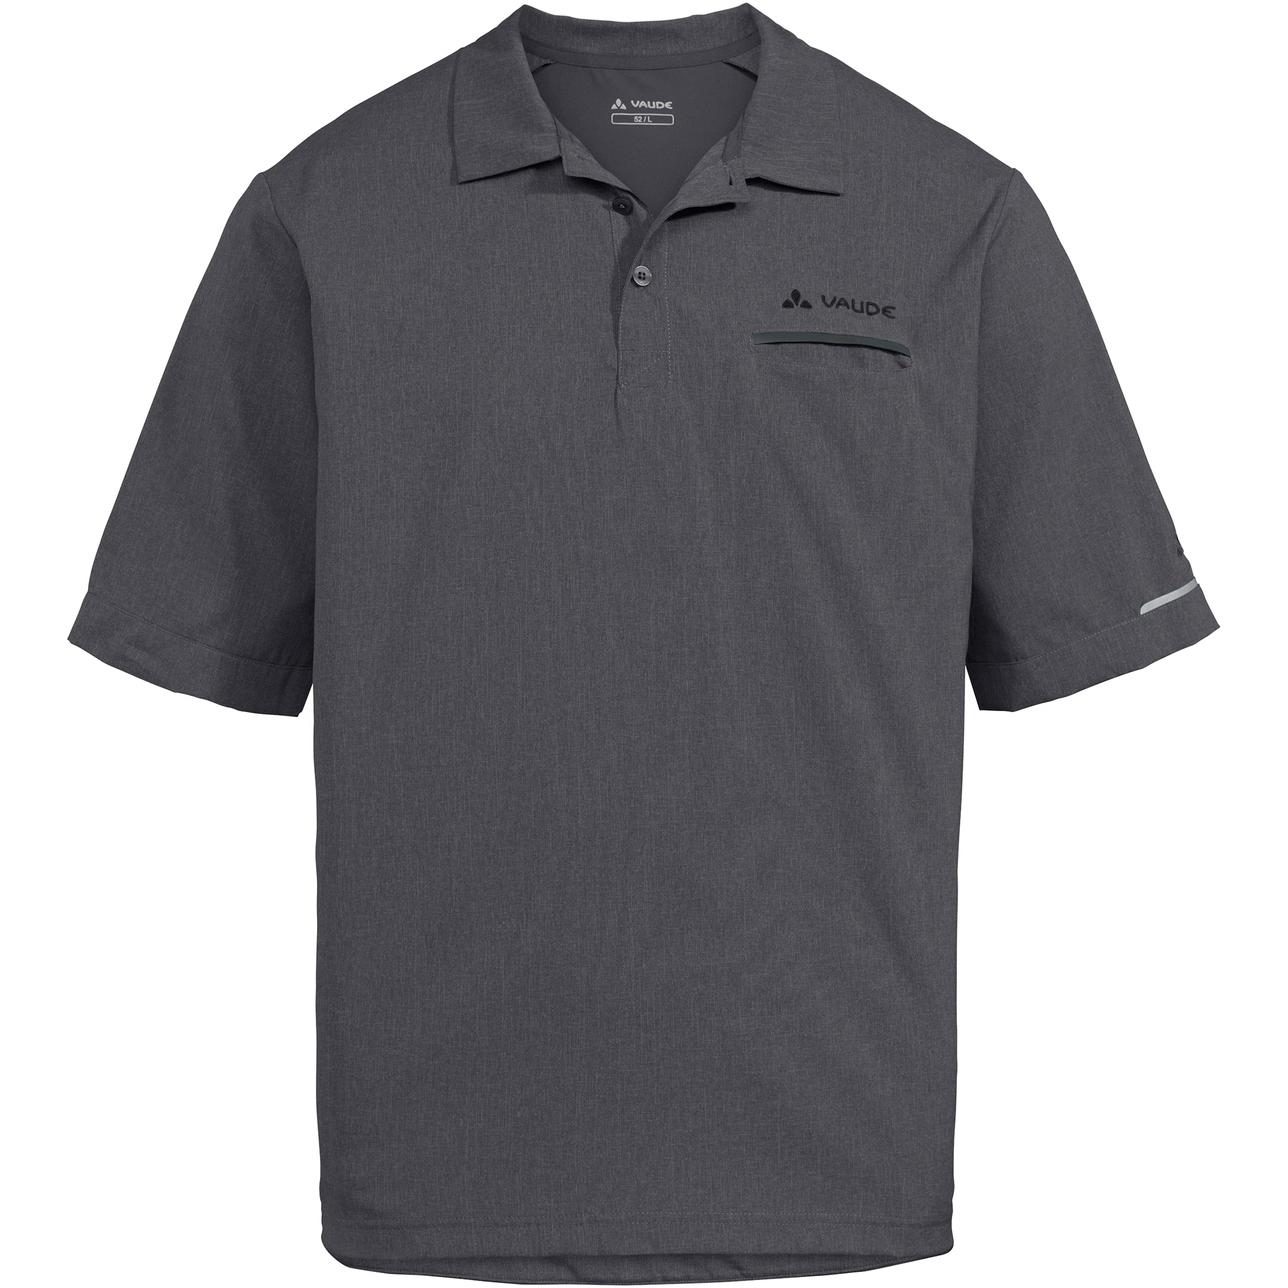 Vaude Turifo Poloshirt - iron